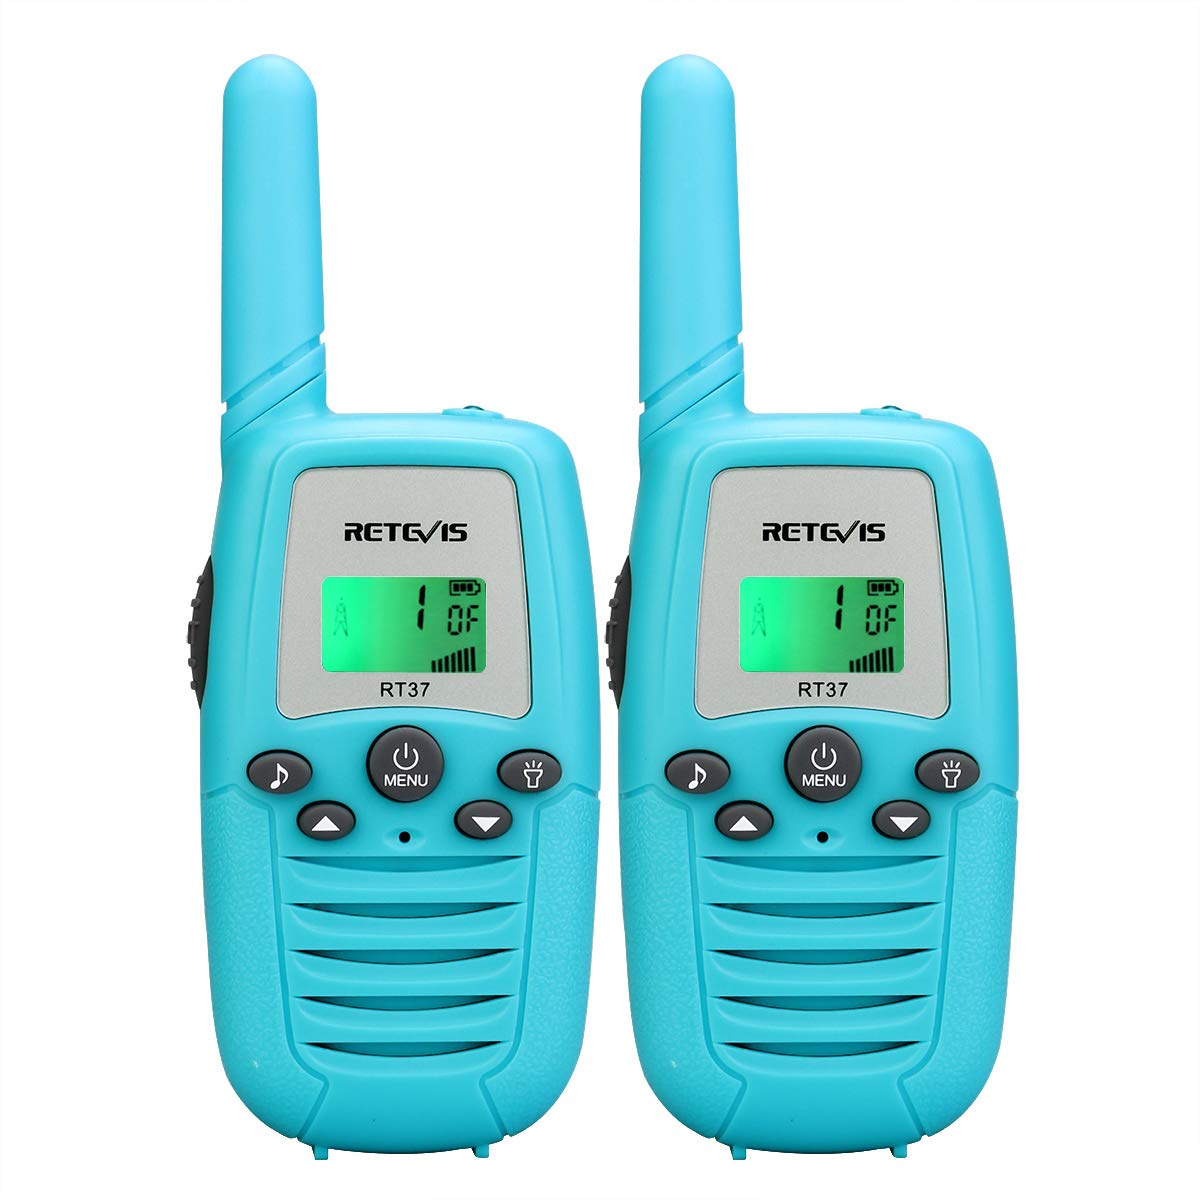 Retevis RT37 Kids Walkie Talkies Gifts Toys for 3-12 Year Old Boys Handheld 2 Way Radio Toy VOX FRS 22CH 99 Pricacy Code Flashlight Long Range Walkie Talkies(Blue, 2 Pack)